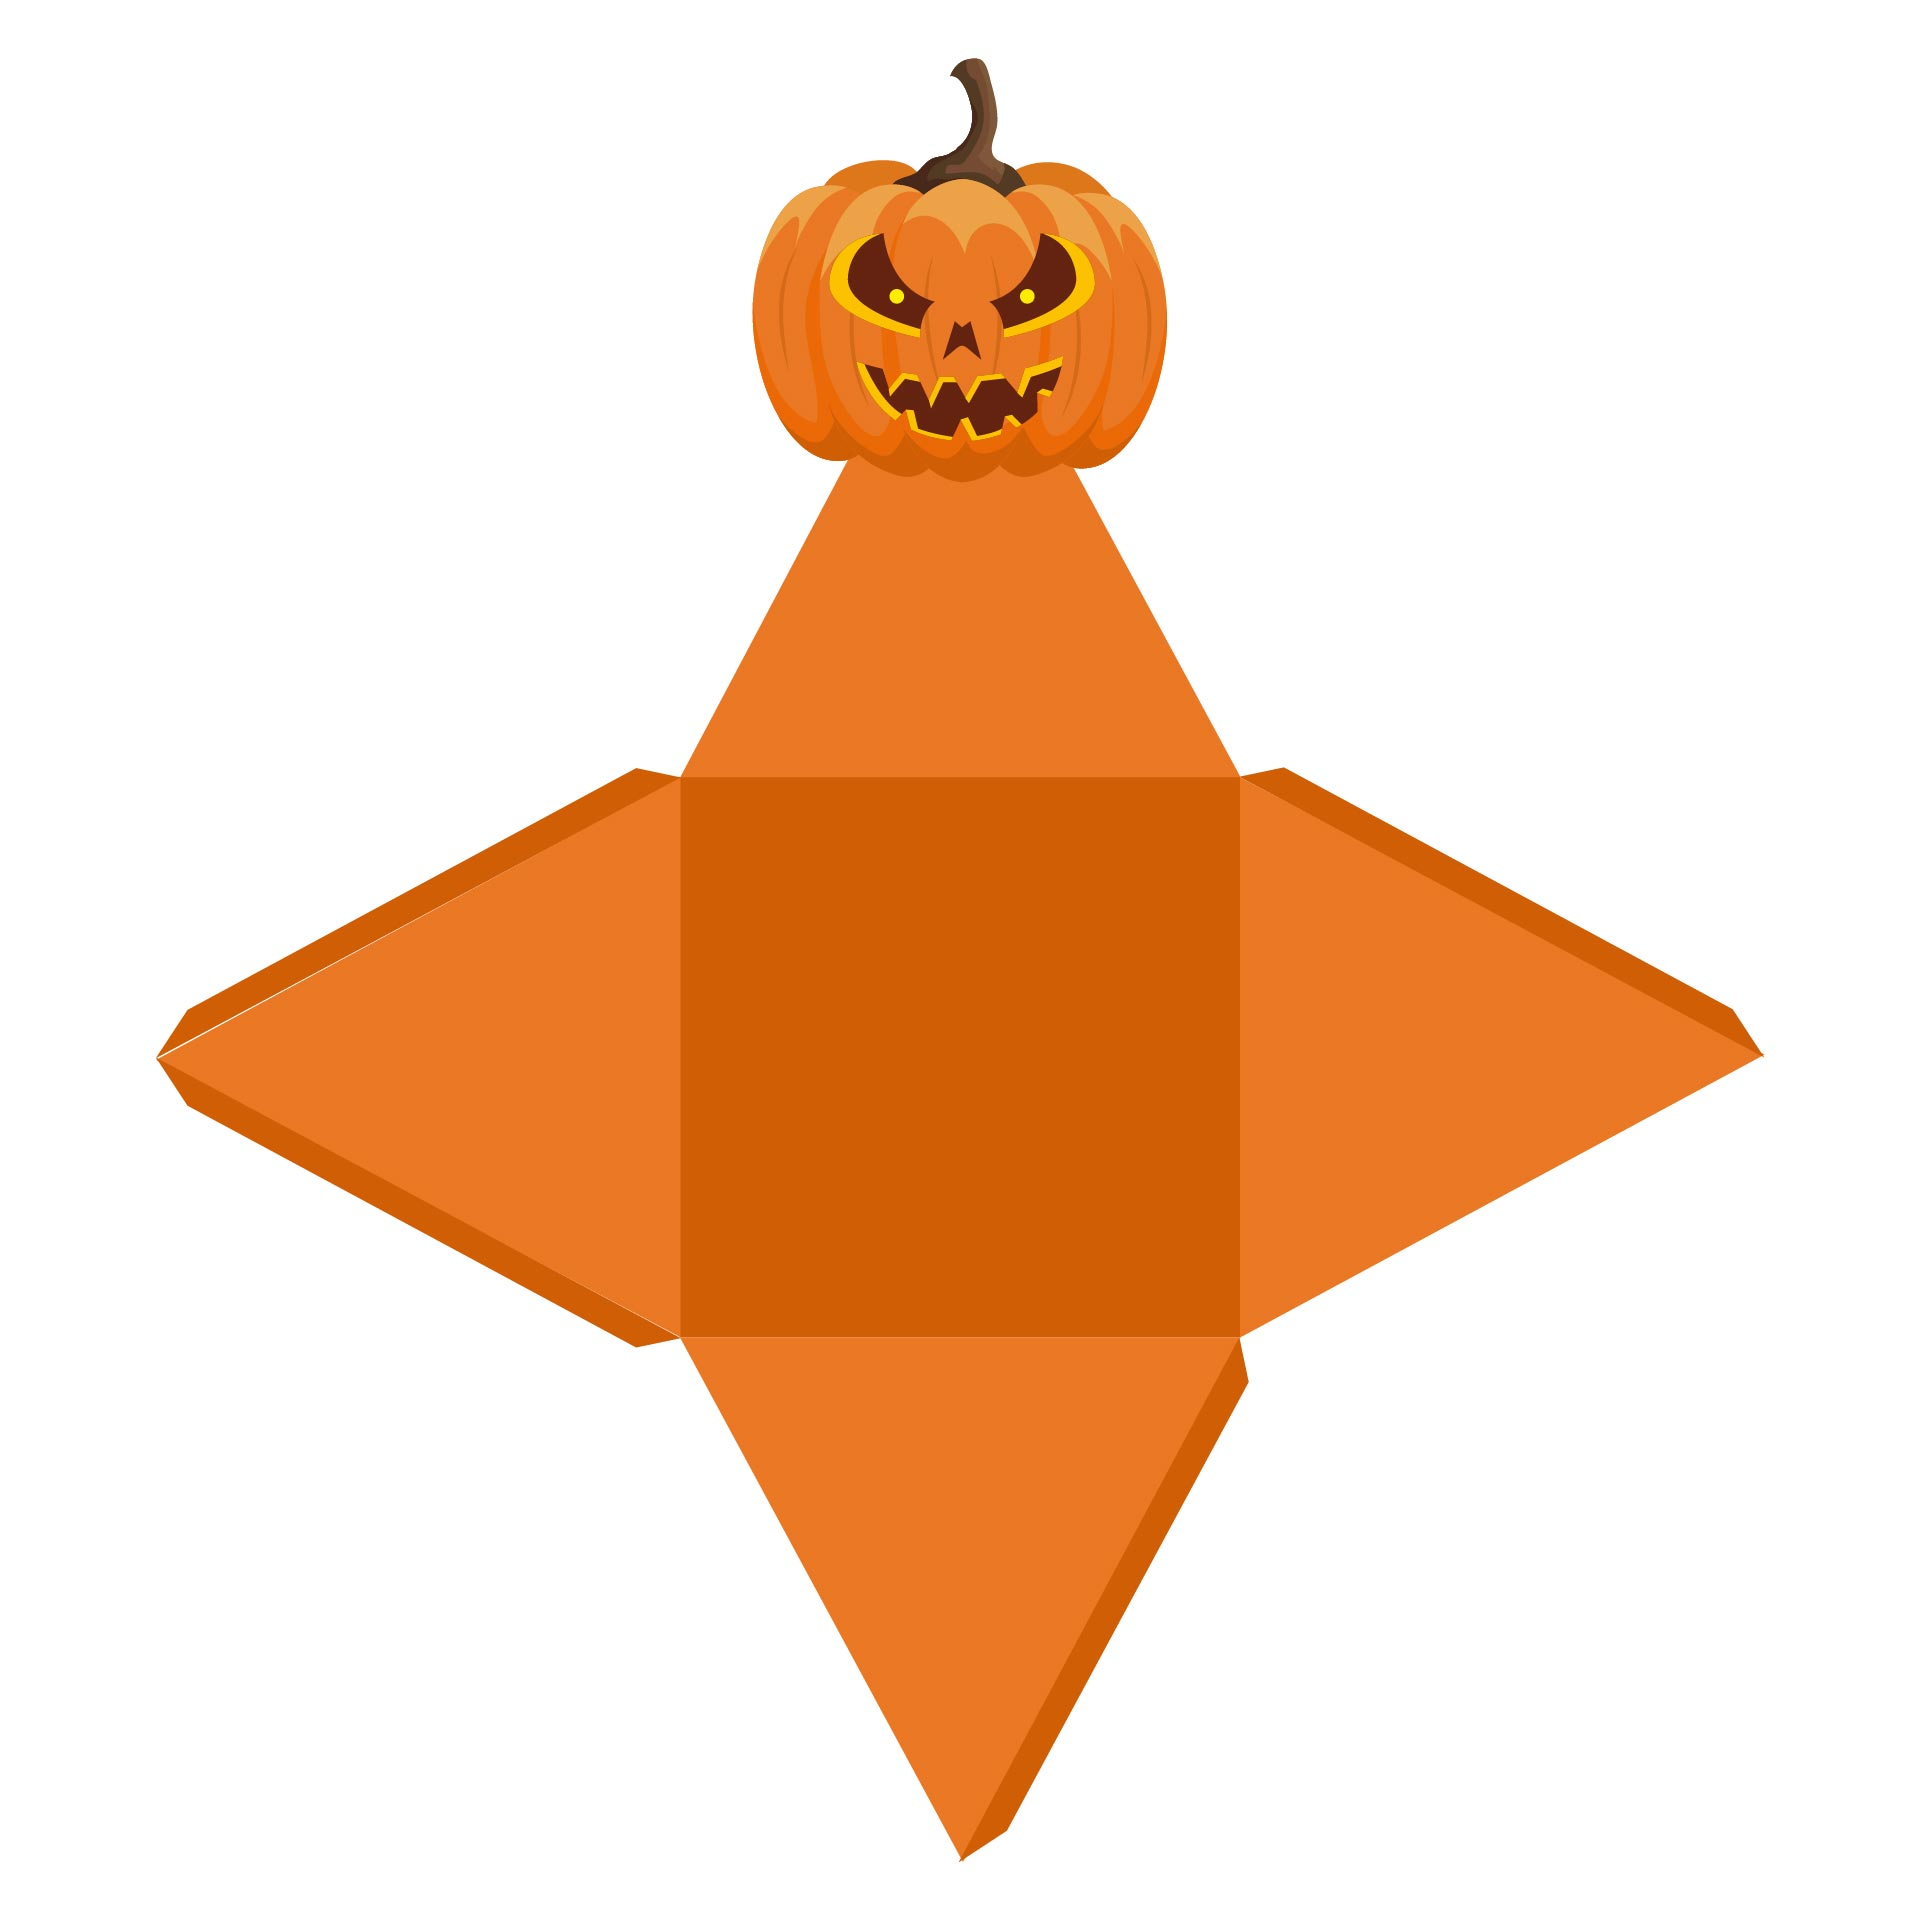 Pyramid Gift Box With Pumpkin Free Printable